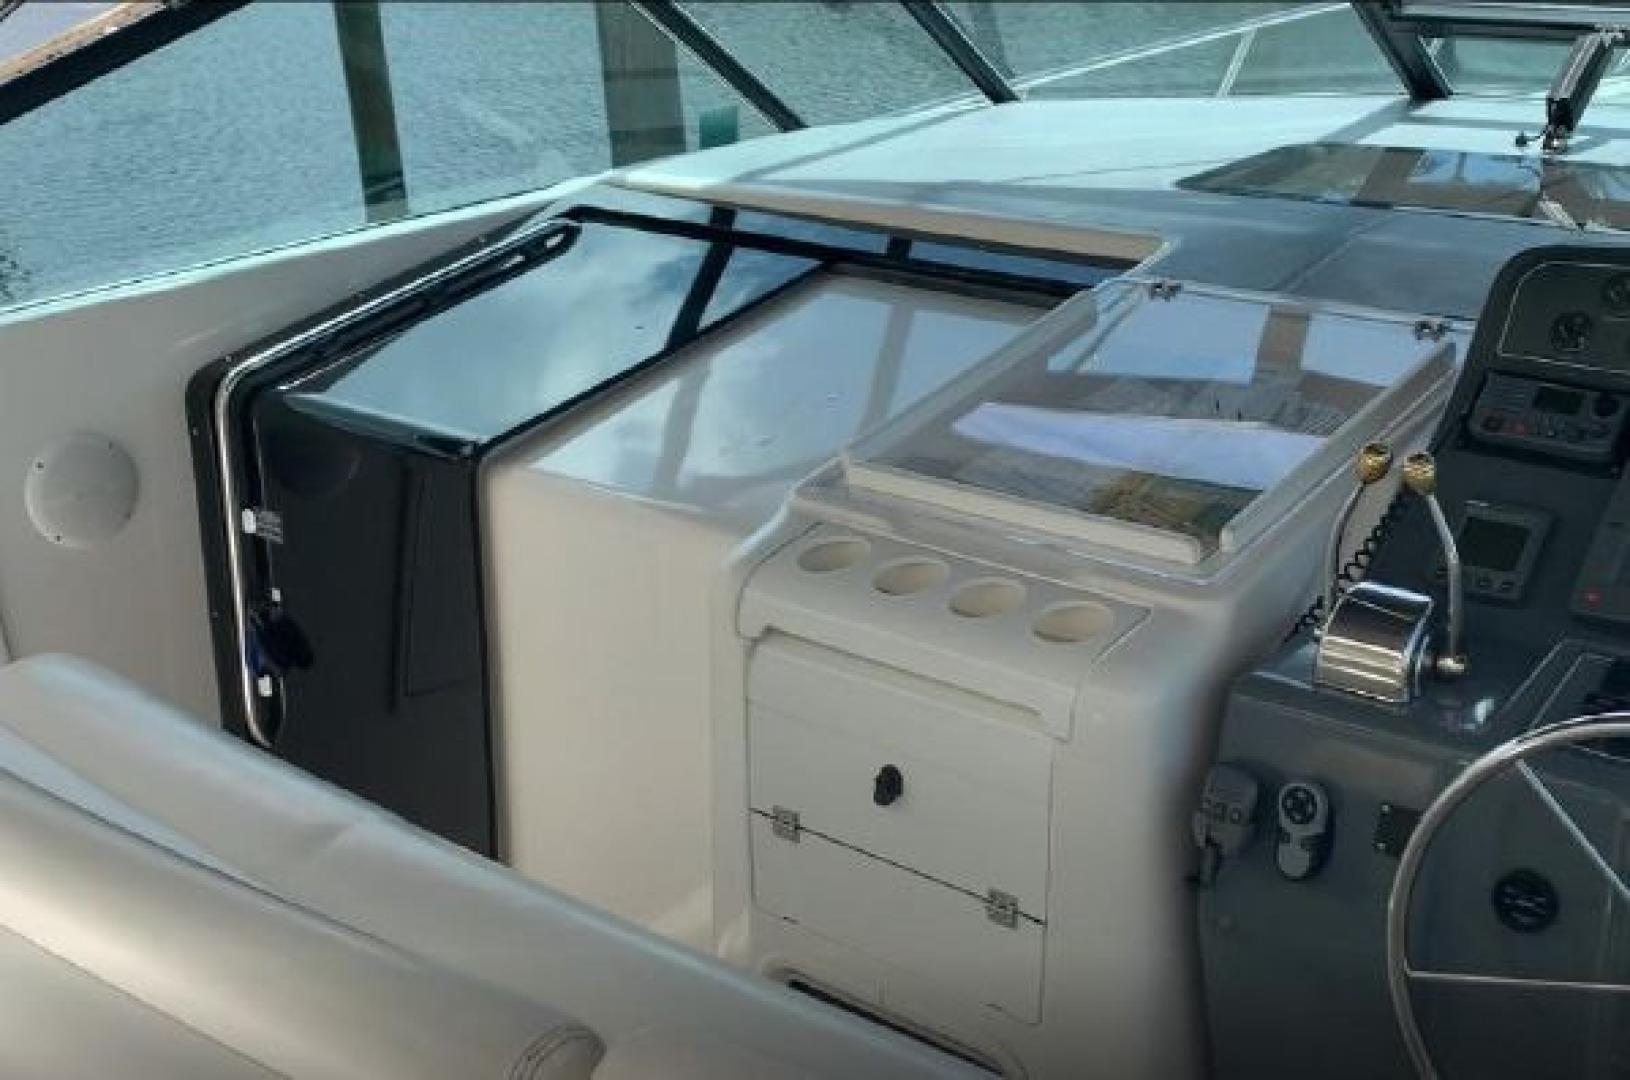 Tiara Yachts-4000 Express Cummins Engines 2001 -Boca Raton-Florida-United States-1564182   Thumbnail